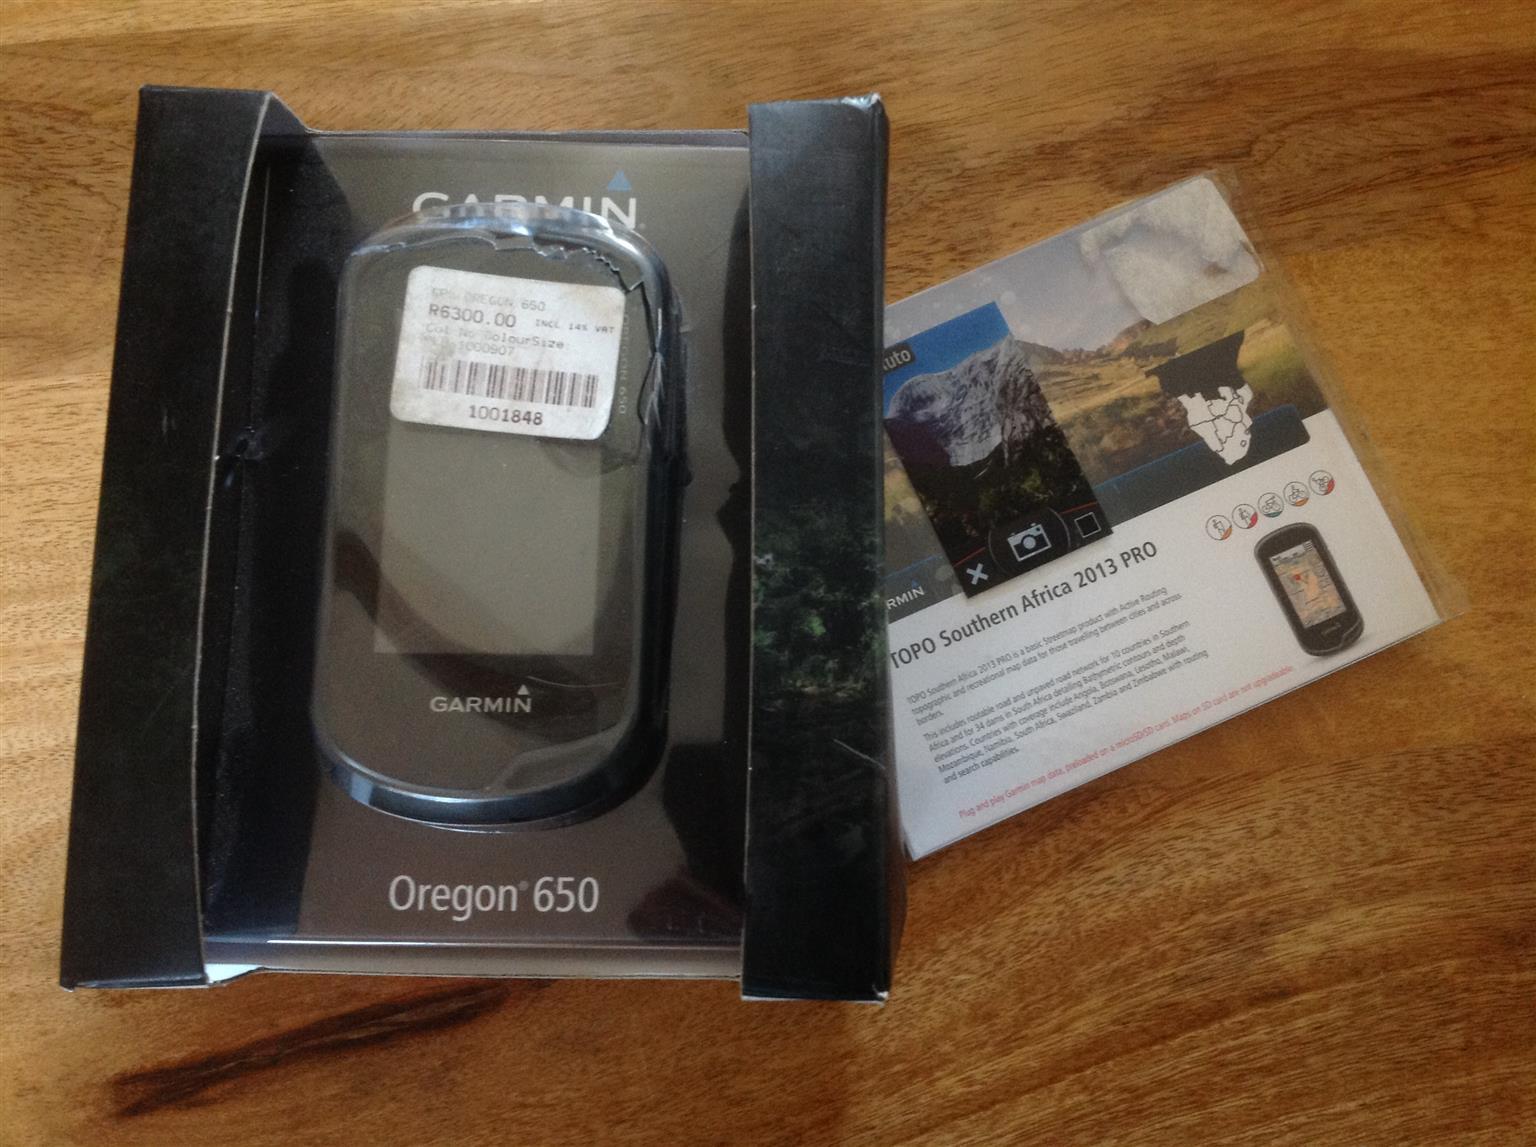 Garmin Oregon 650